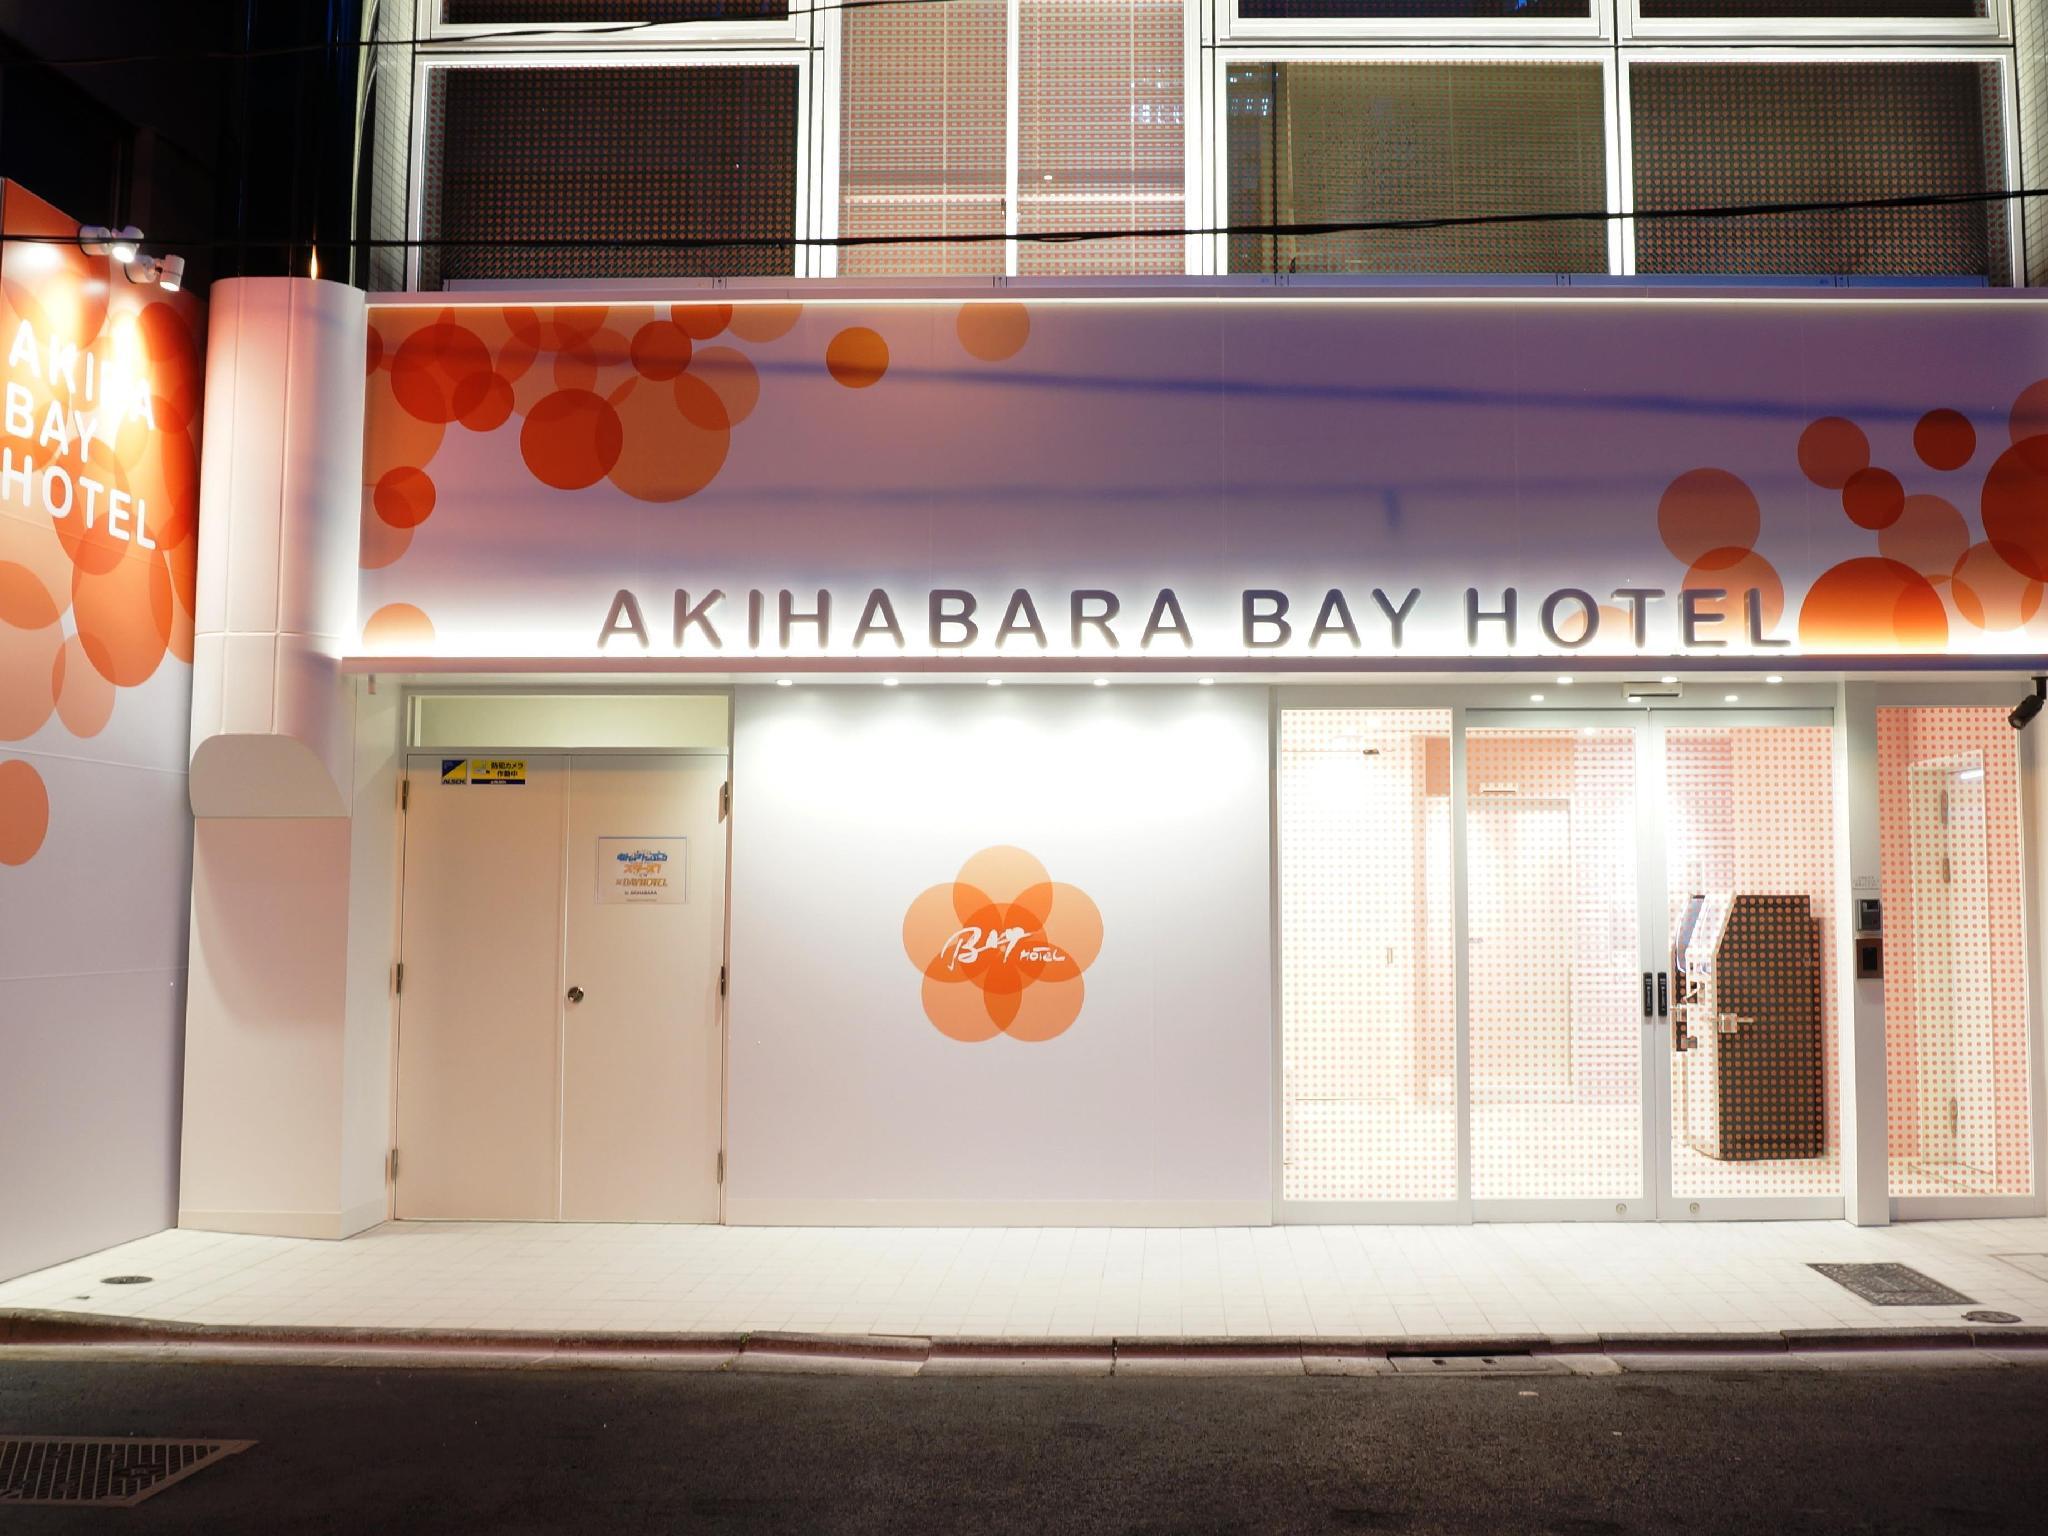 Akihabara Bay Hotel (Female Only), Chiyoda